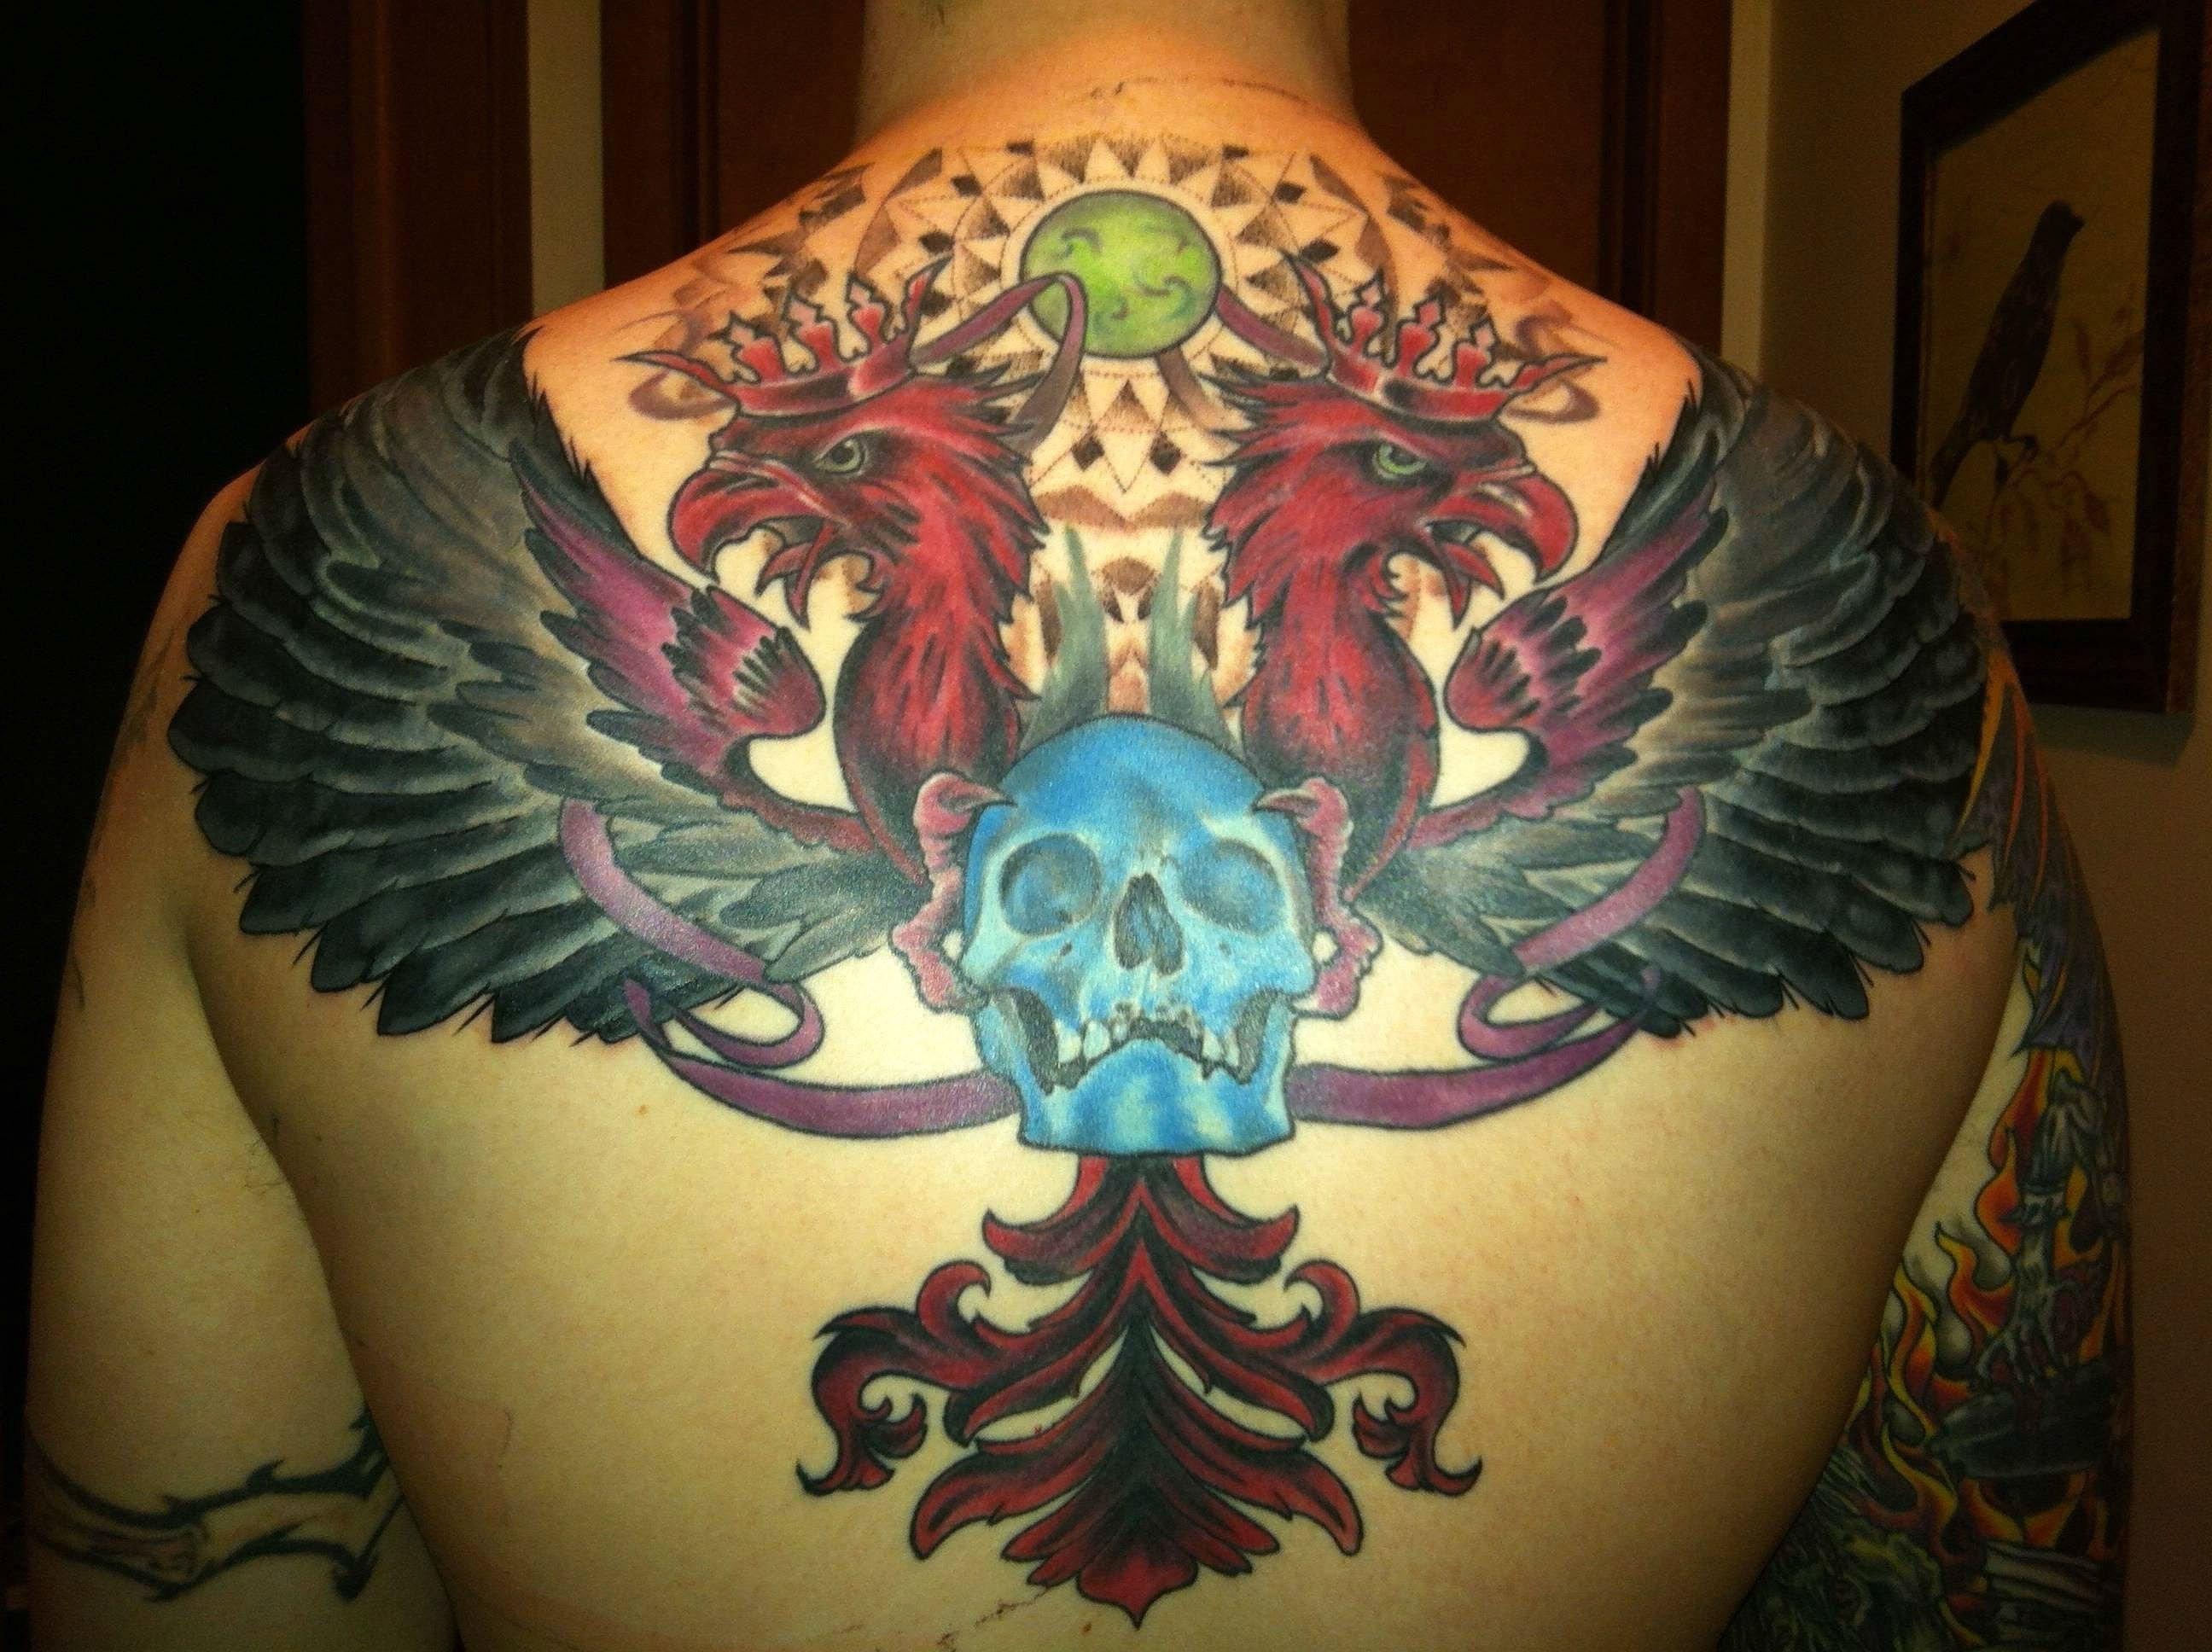 MASTODON sludge metal progressive heavy tattoo wallpaper | |  491903 | WallpaperUP